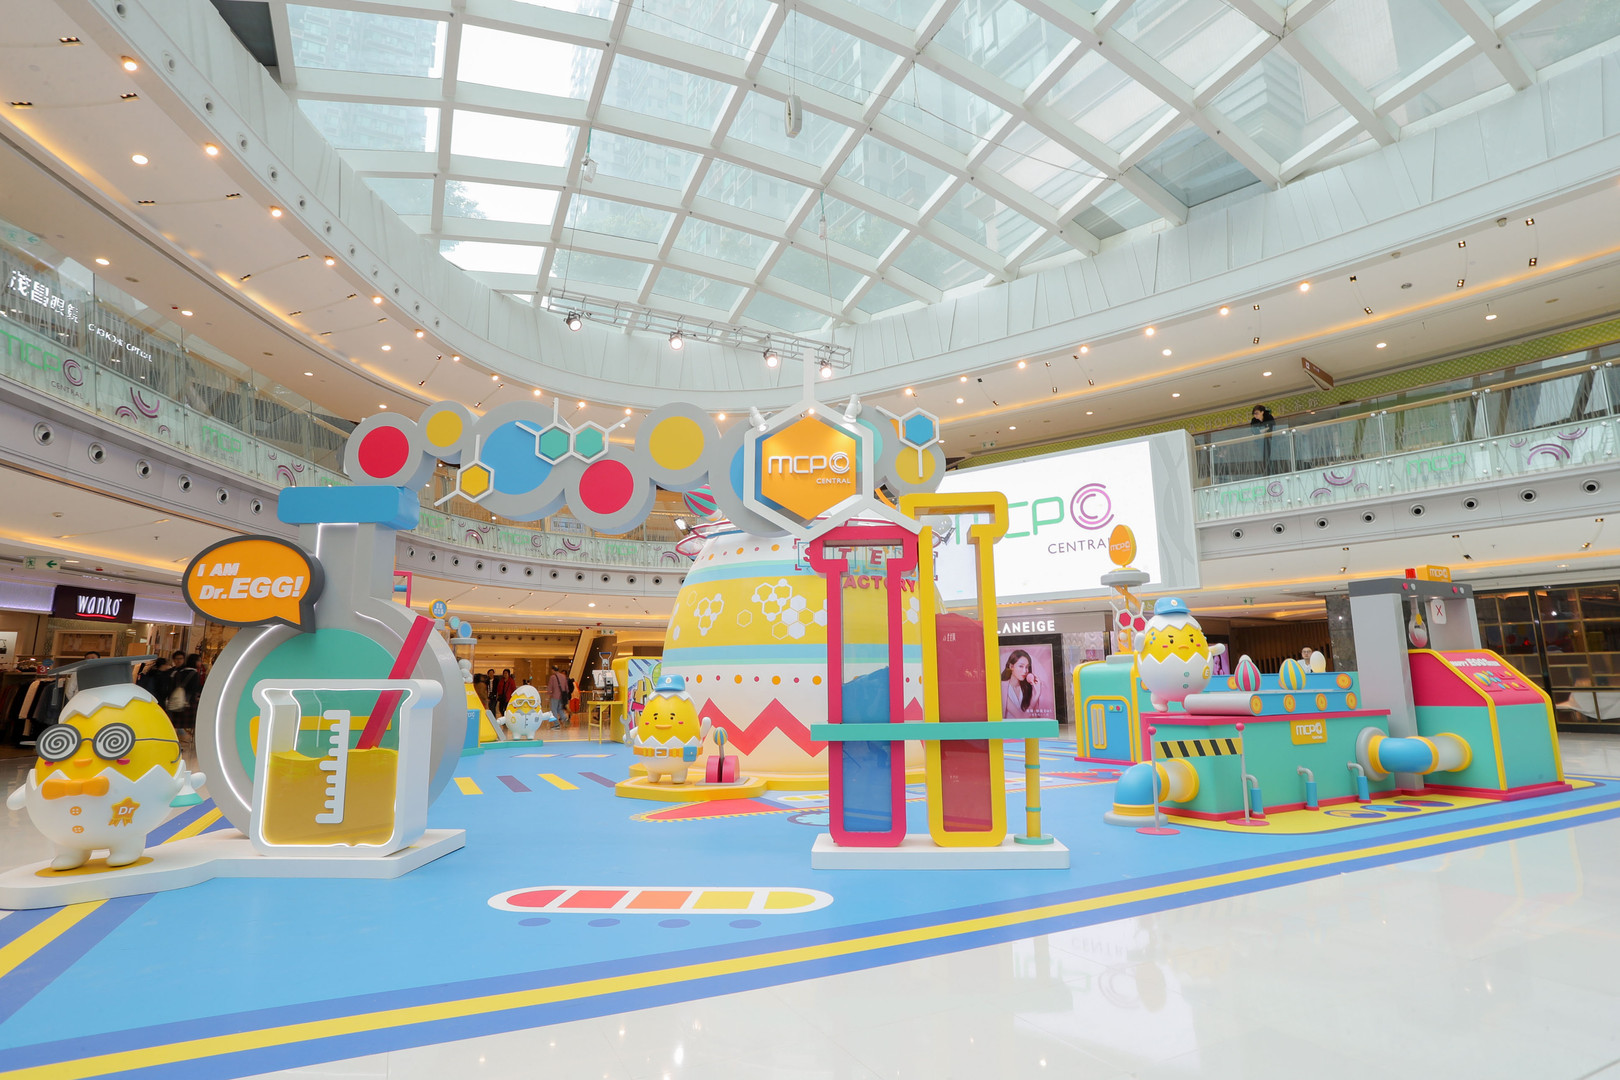 Metro Plaza Two & Three Easter Project 新都城中心二期及三期复活节项目 2019